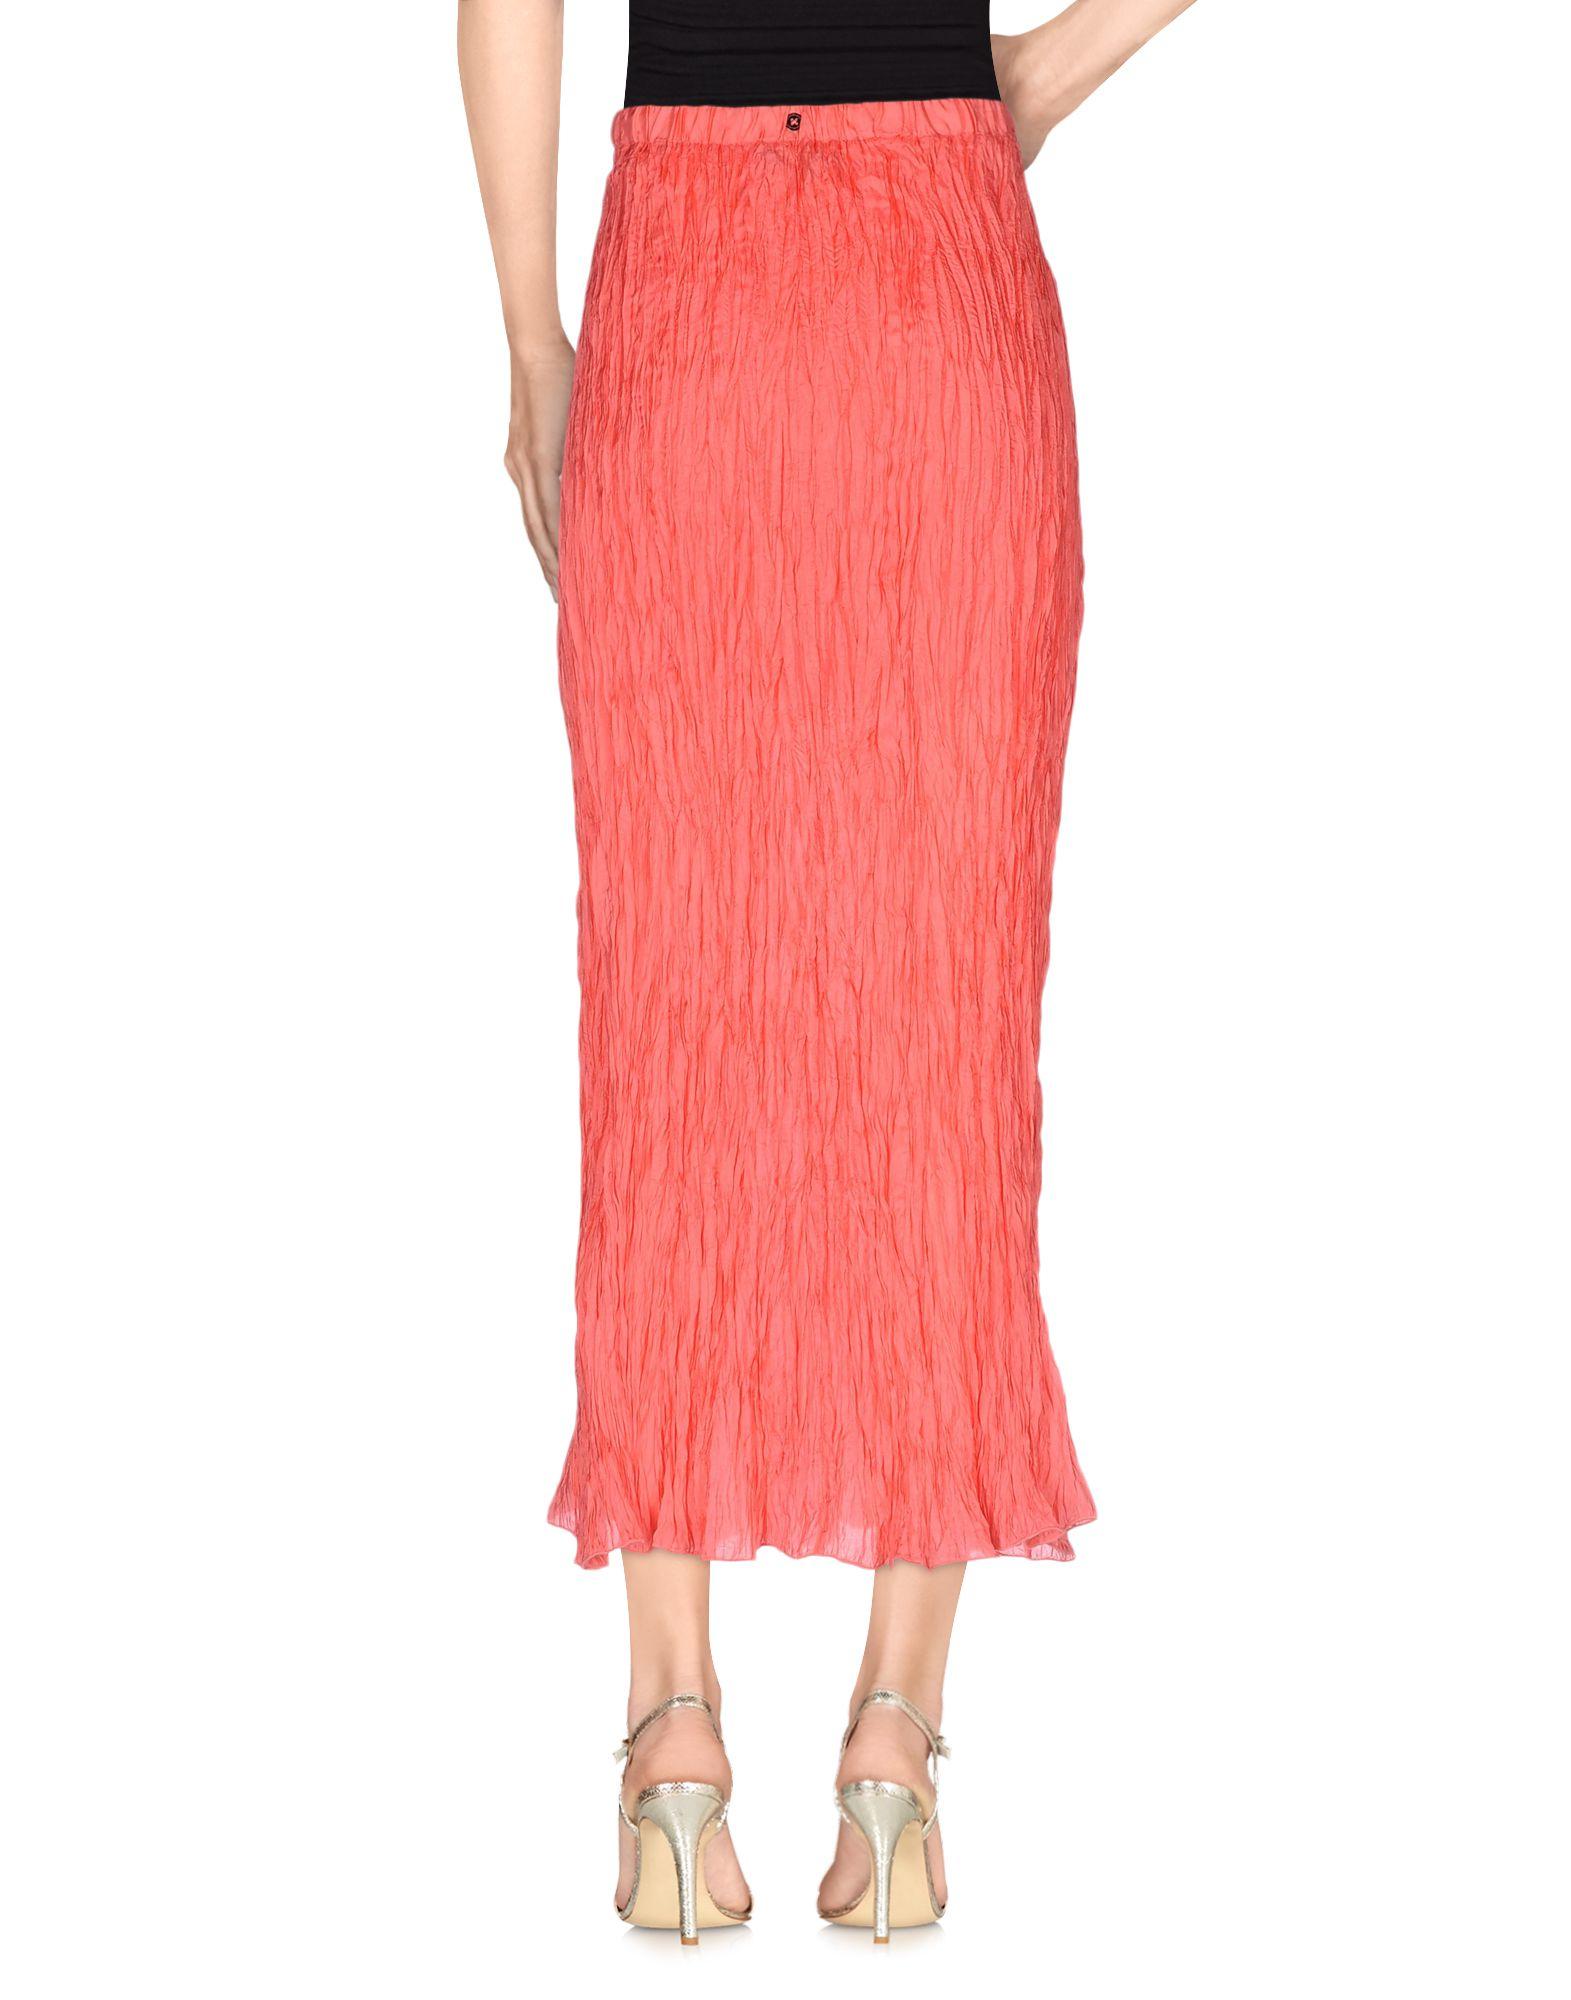 Lyst - Pennyblack Long Skirt in Red